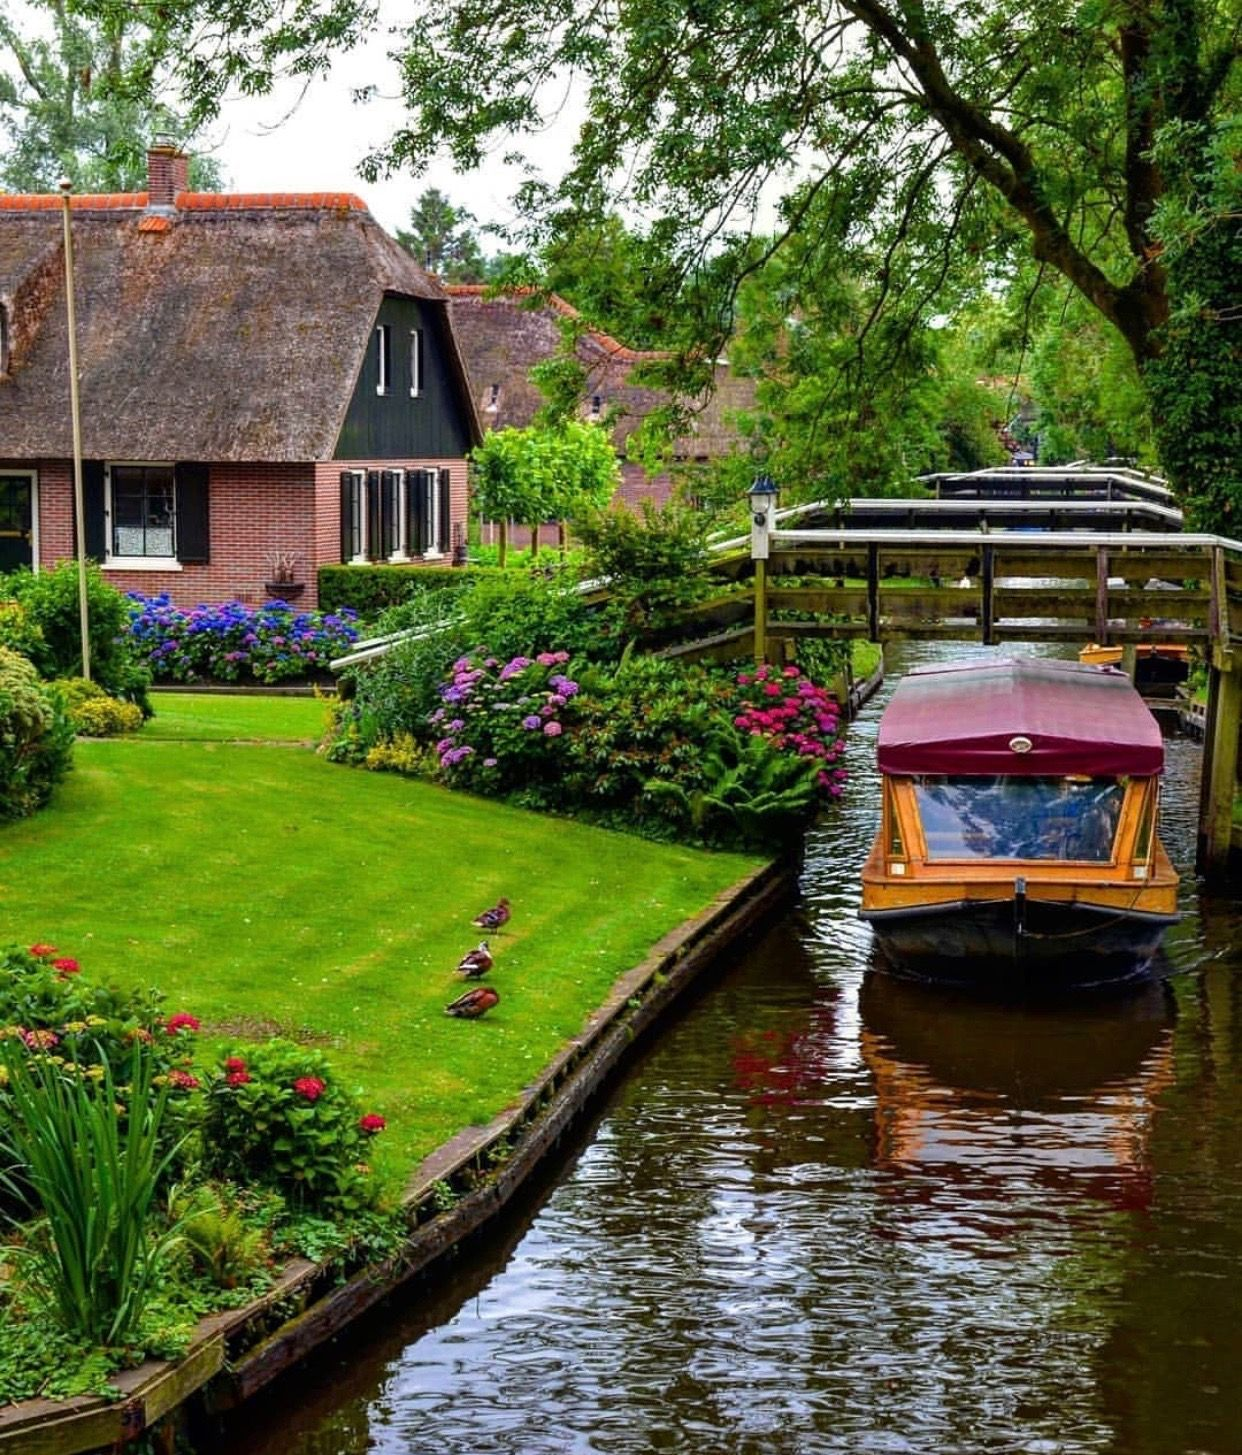 Holland Giethoorn by Juampi Holland Giethoorn by